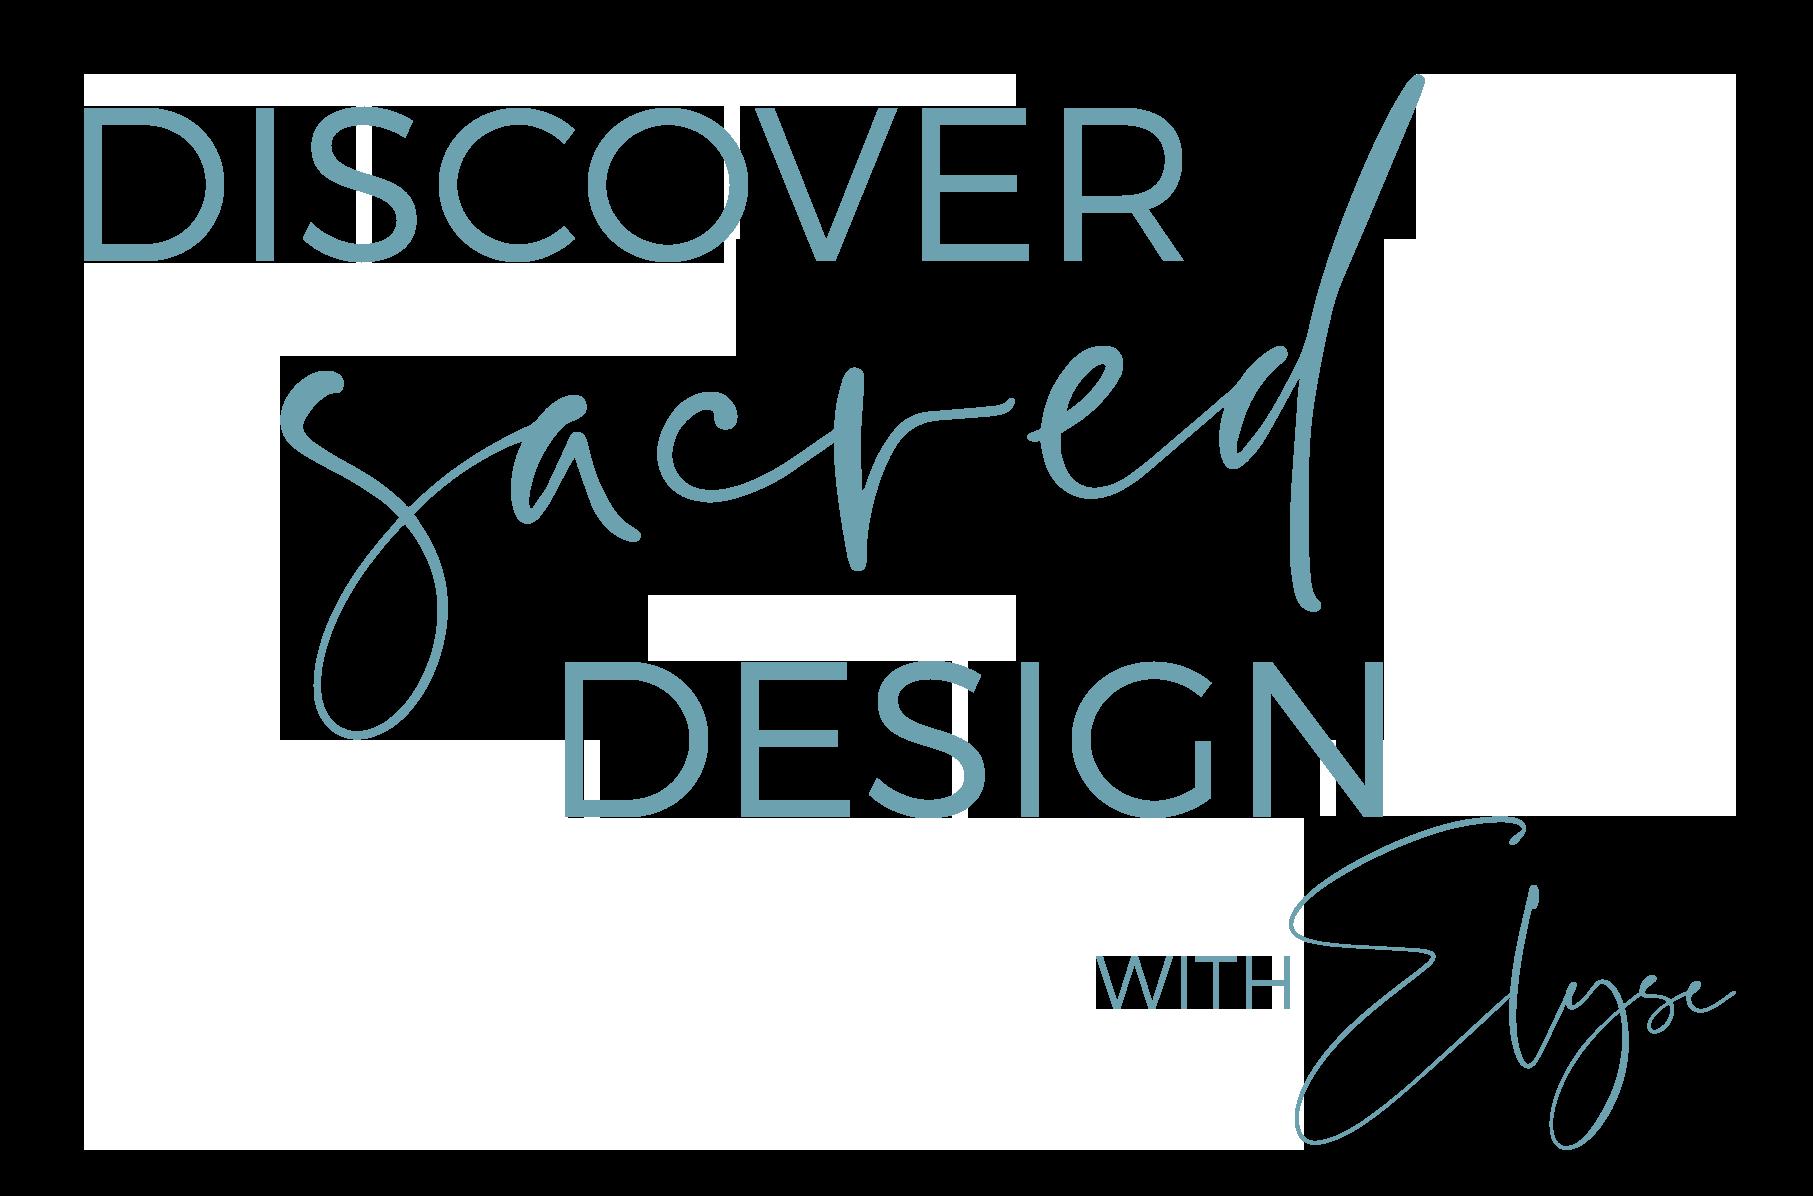 sacred-design-with-elyse-final-final.png